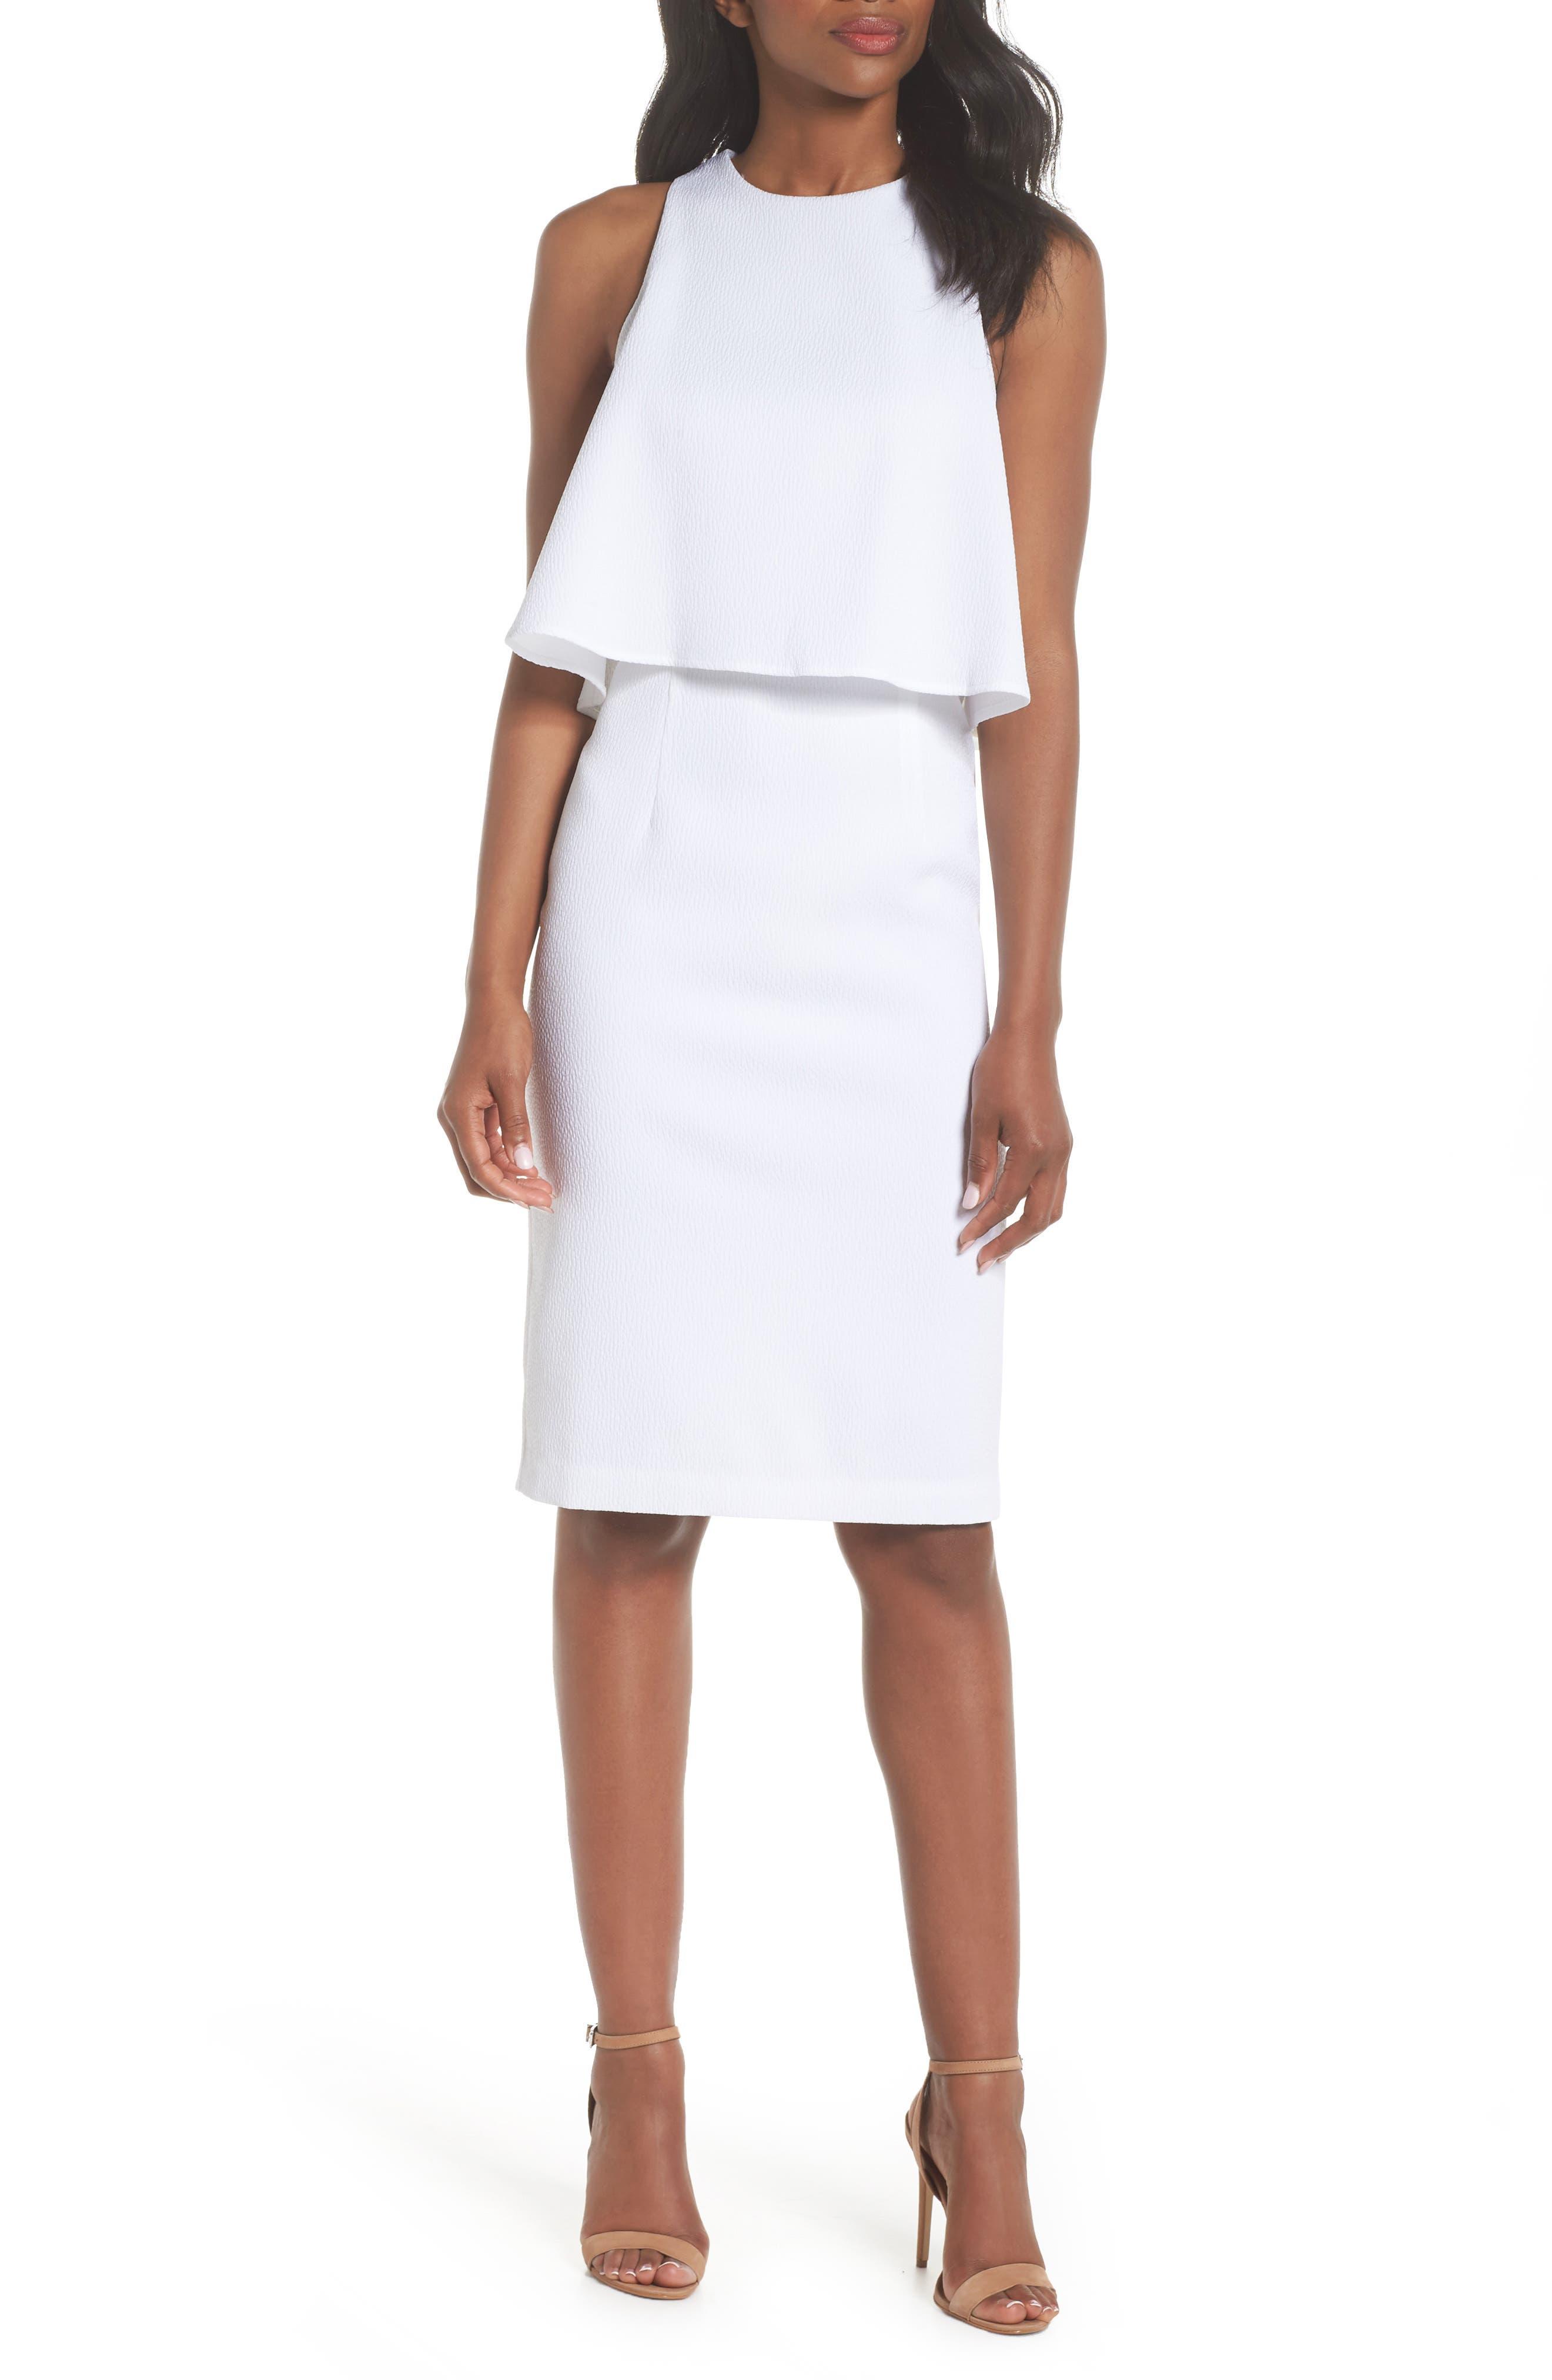 CHELSEA28, Popover Crop Sheath Dress, Main thumbnail 1, color, WHITE SNOW